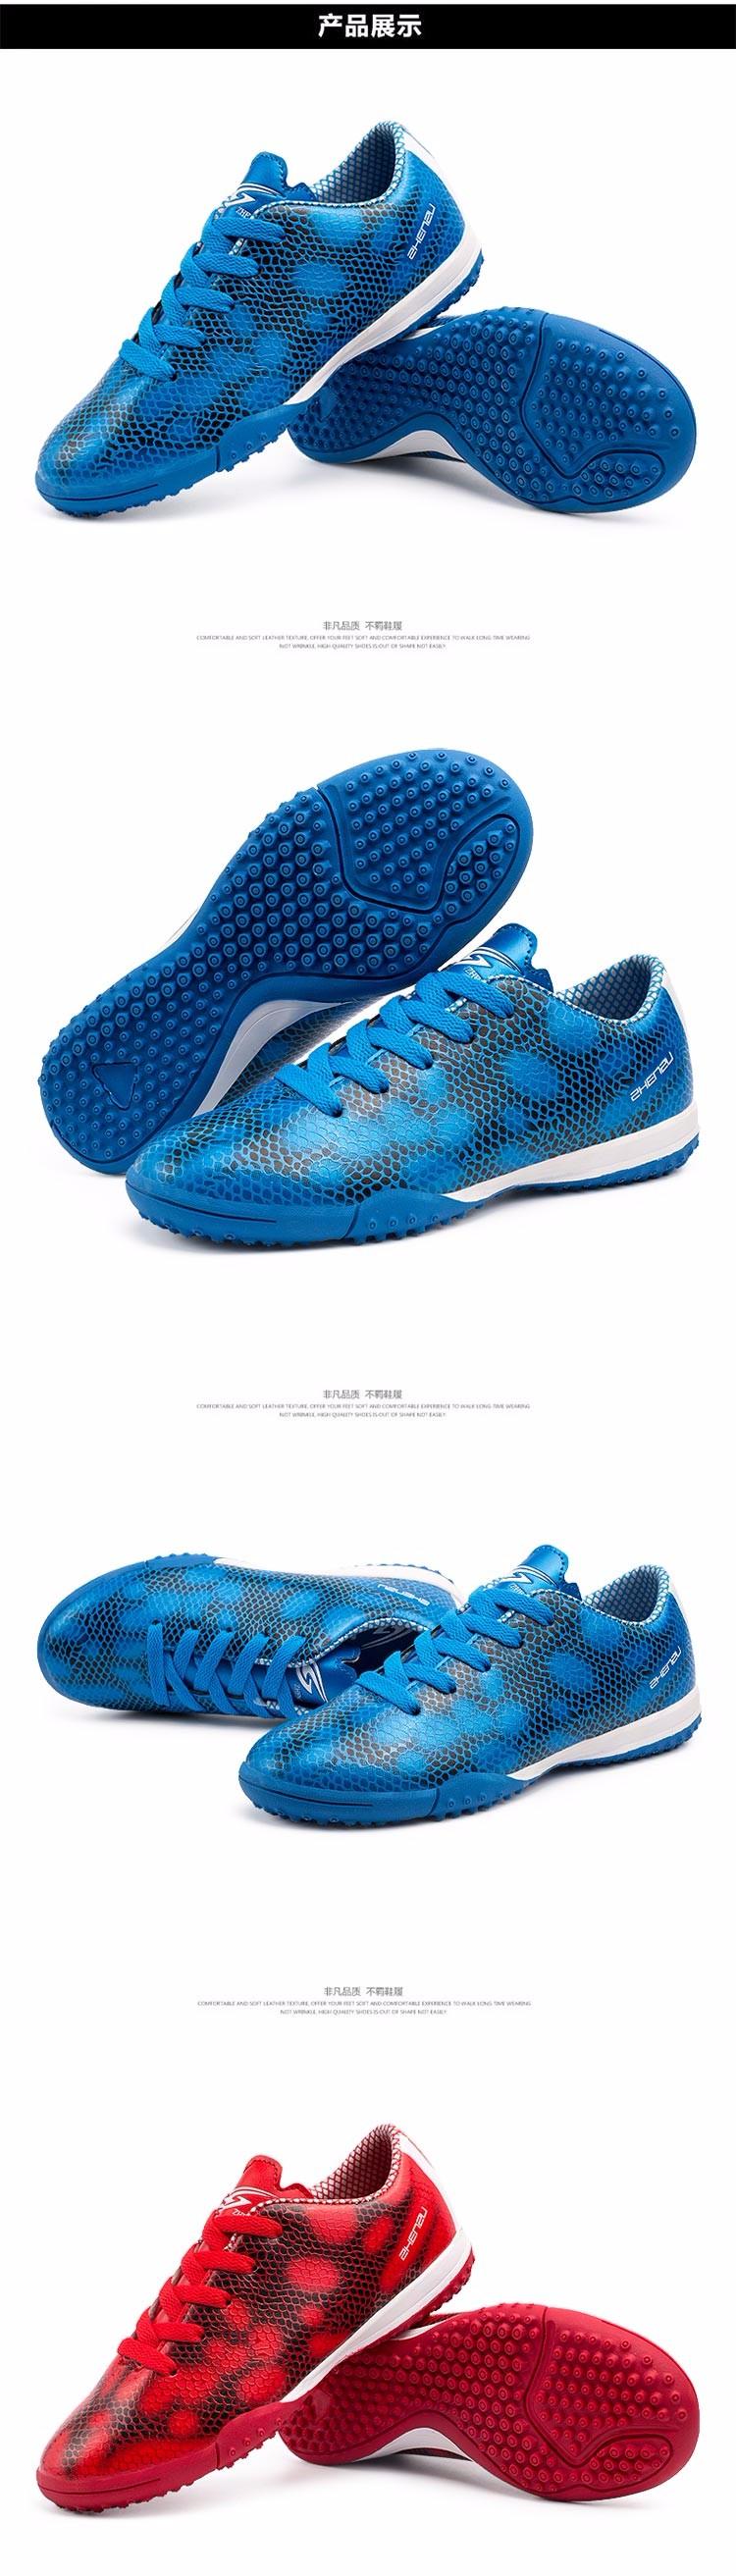 ZHENZU Football Boots Superfly Original Soccer Shoes Cleats Kids Teenagers Training AG HG TF voetbalschoenen chuteira futebol 1